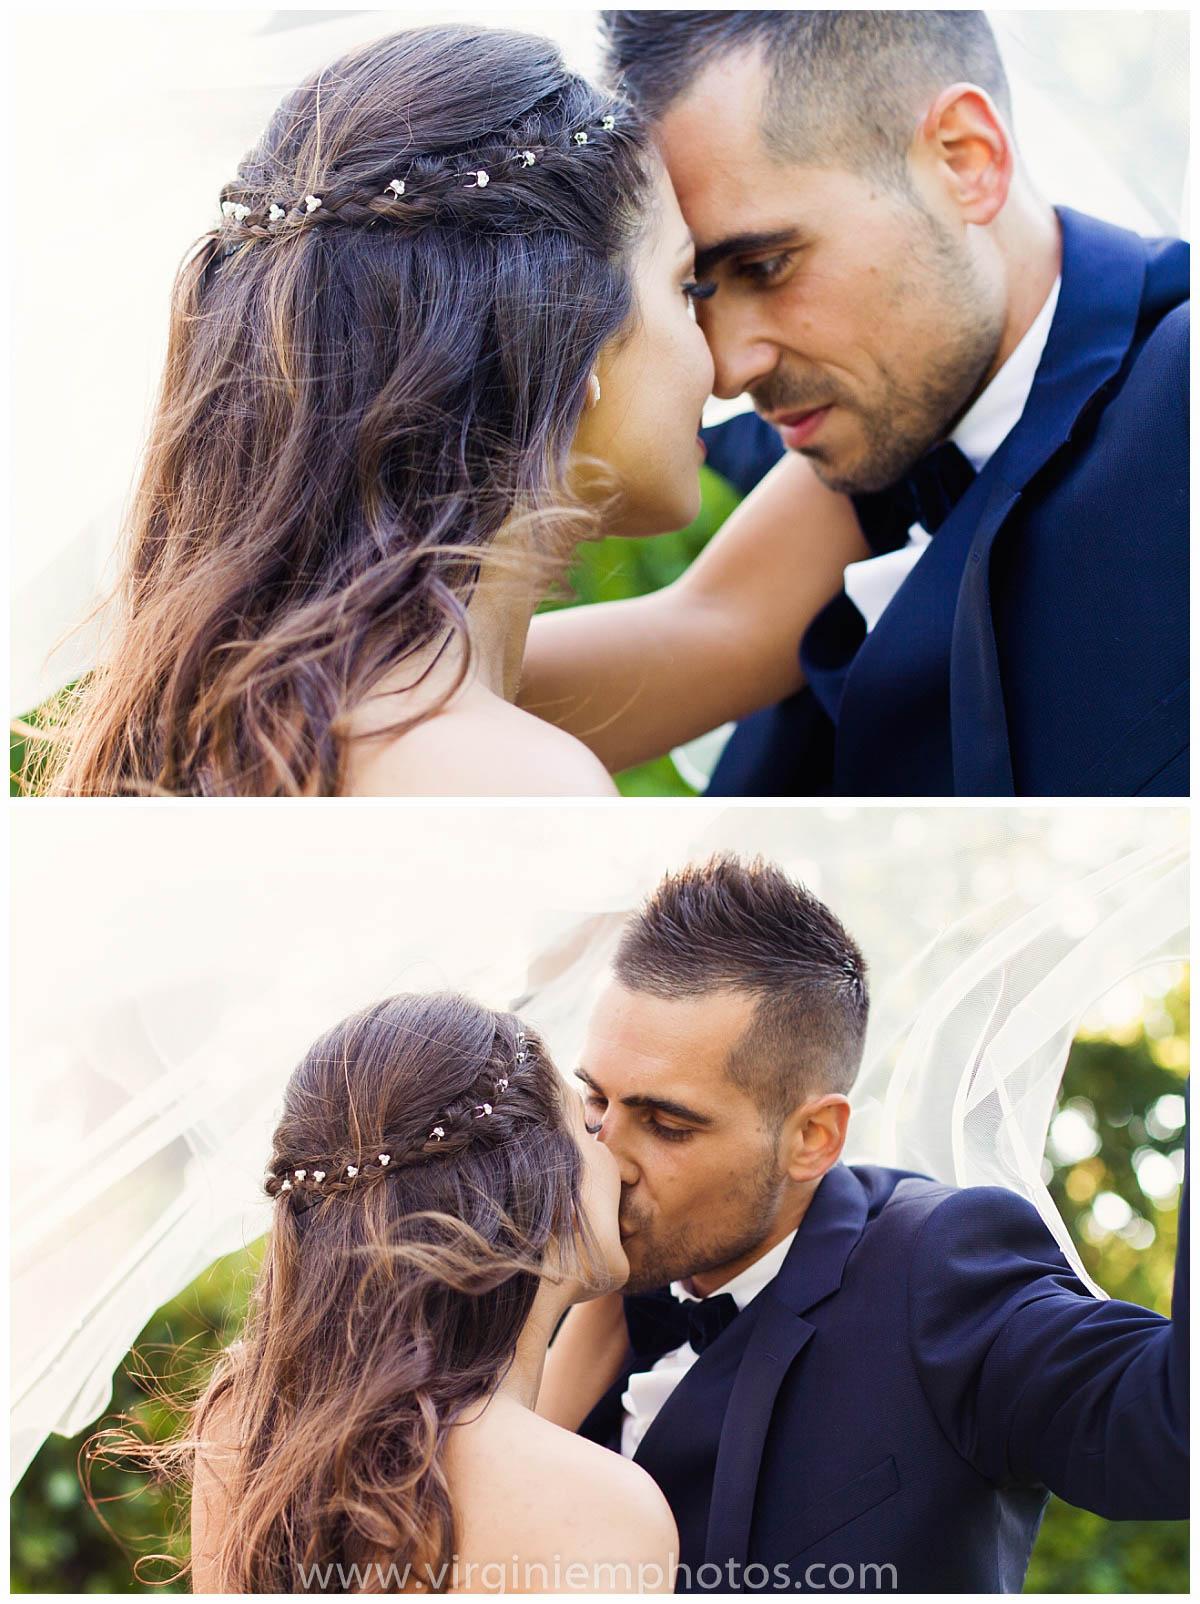 Virginie M. Photos-photographe nord-mariage-couple (4)